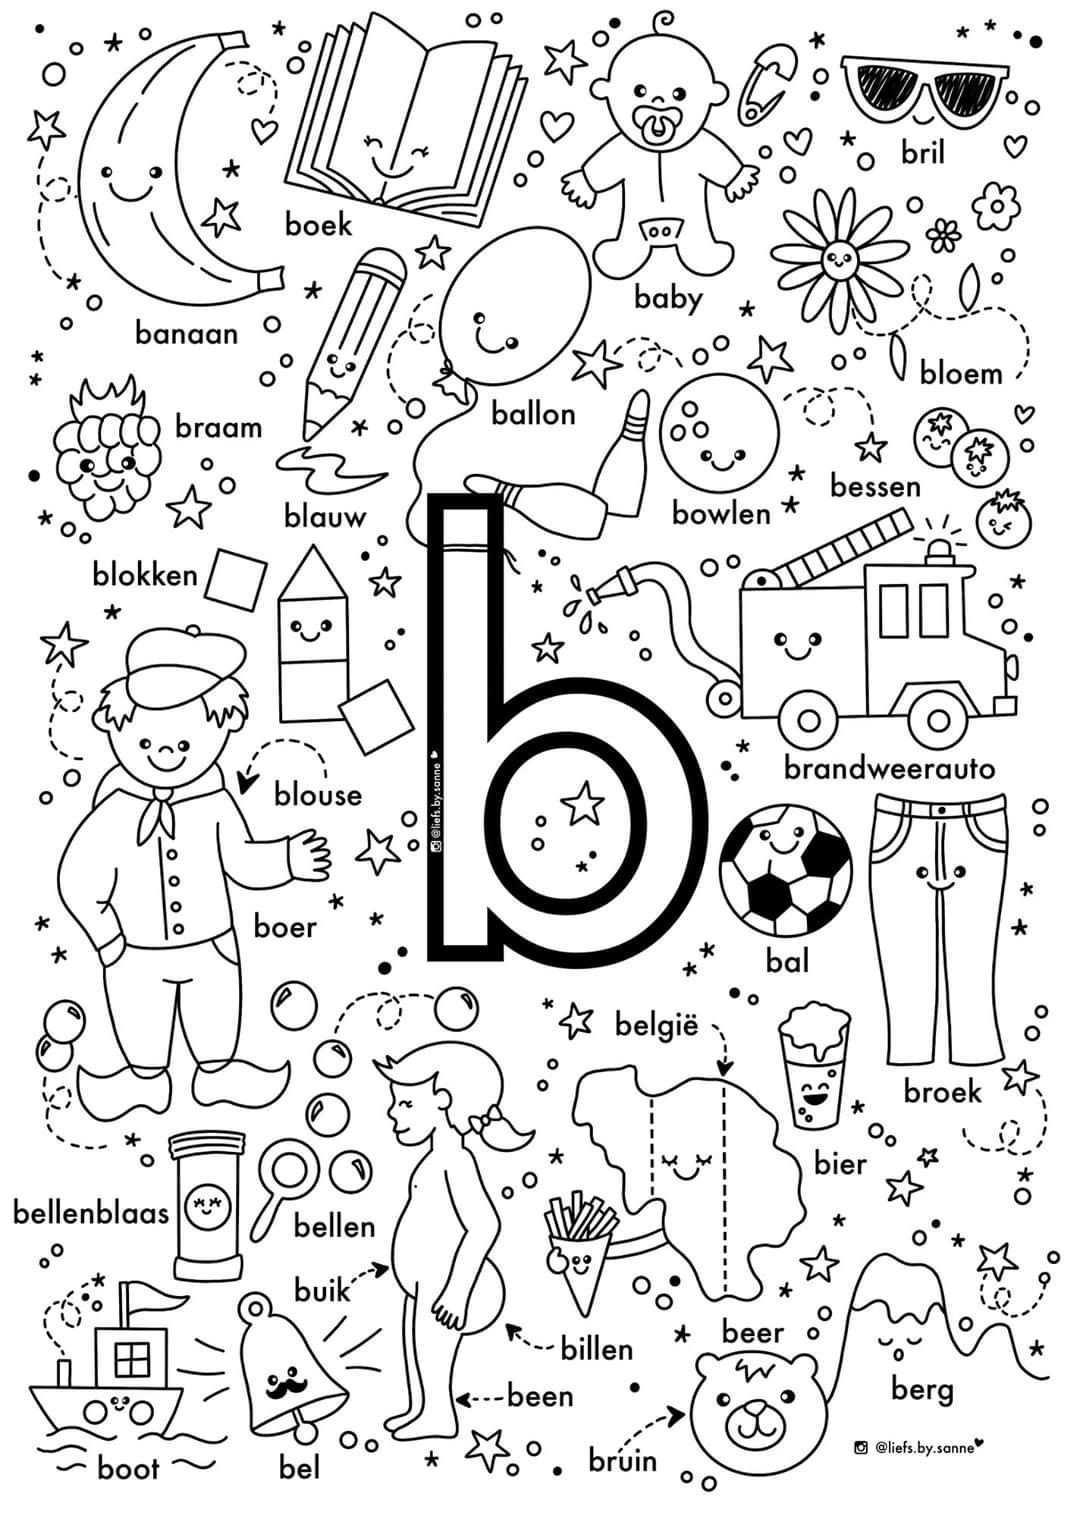 B Woorden Kleurplaat In 2020 Letterherkenning Spelletjes Letterherkenning Geletterdheid